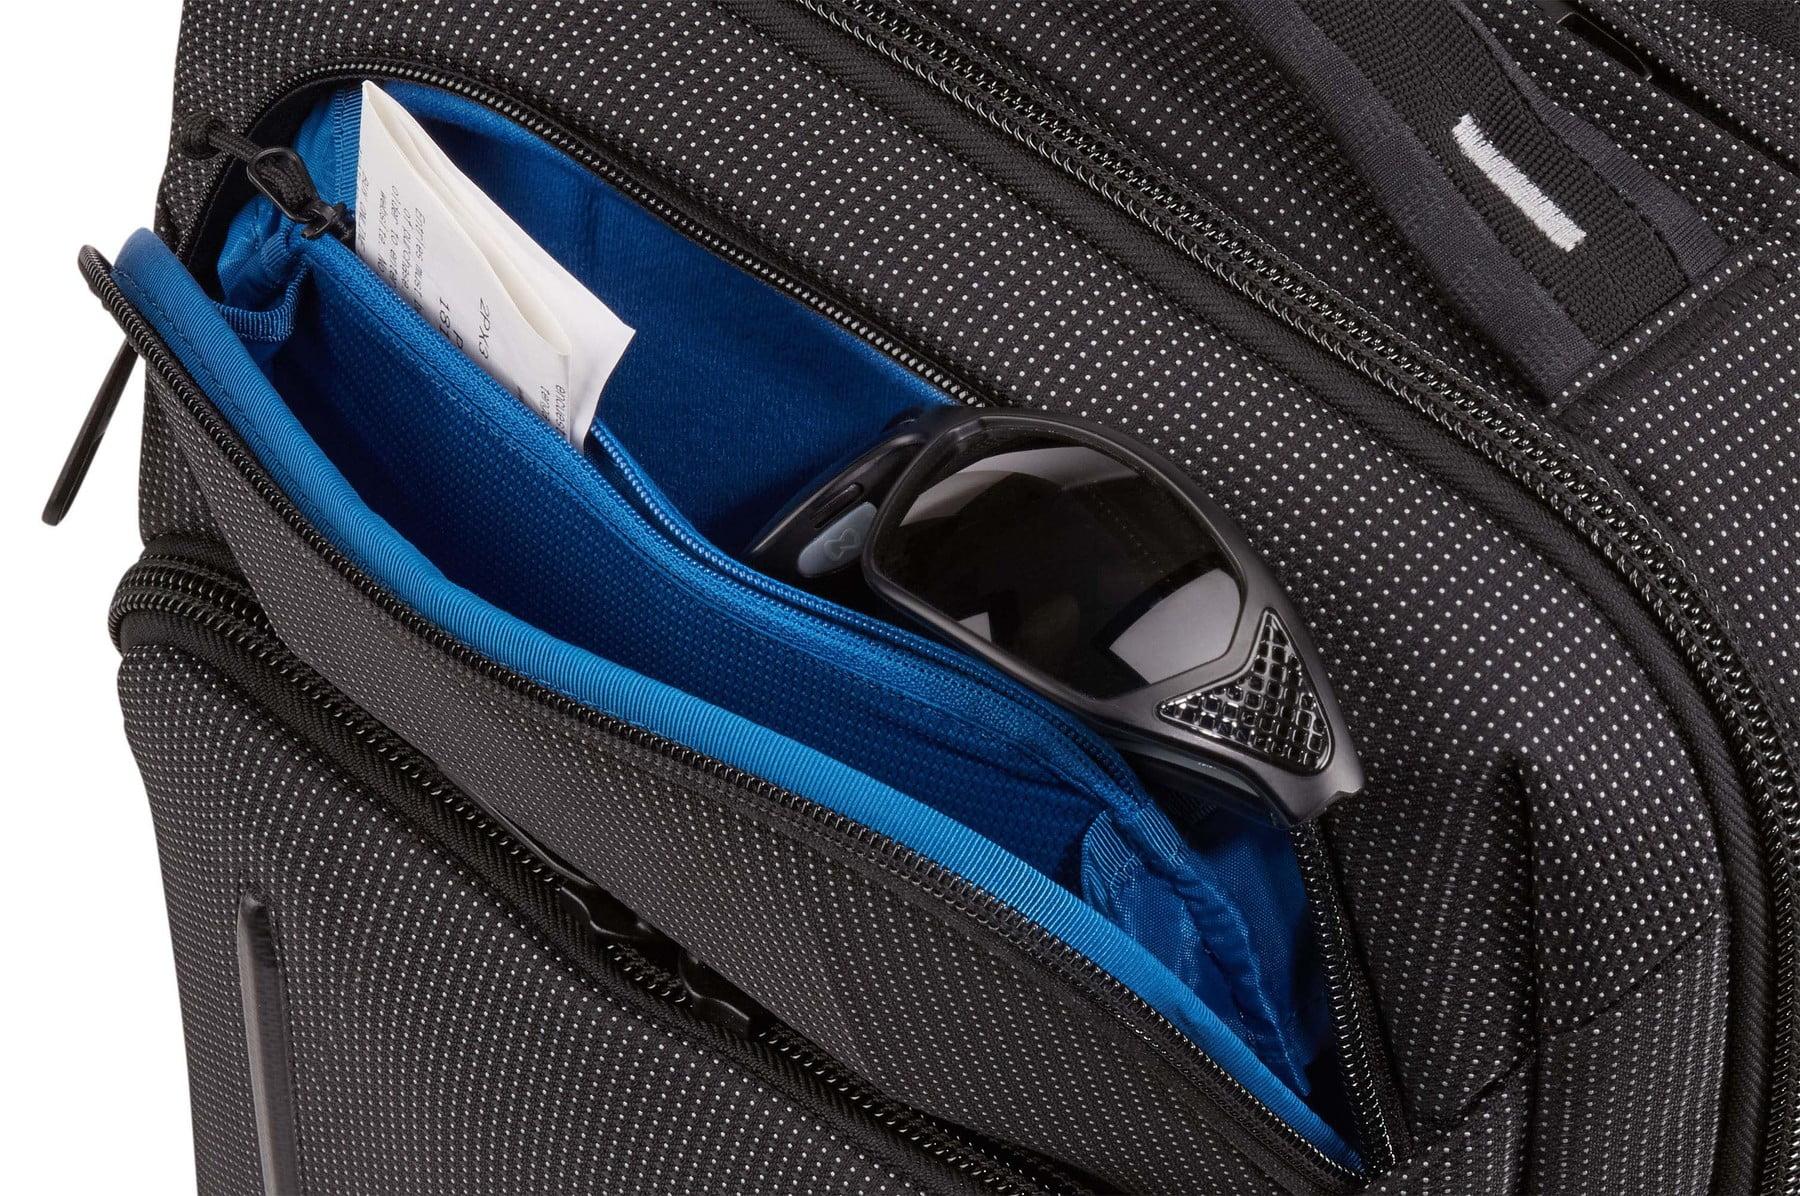 Geanta laptop Thule Crossover 2 Convertible Laptop Bag 15.6 inchi Black 1